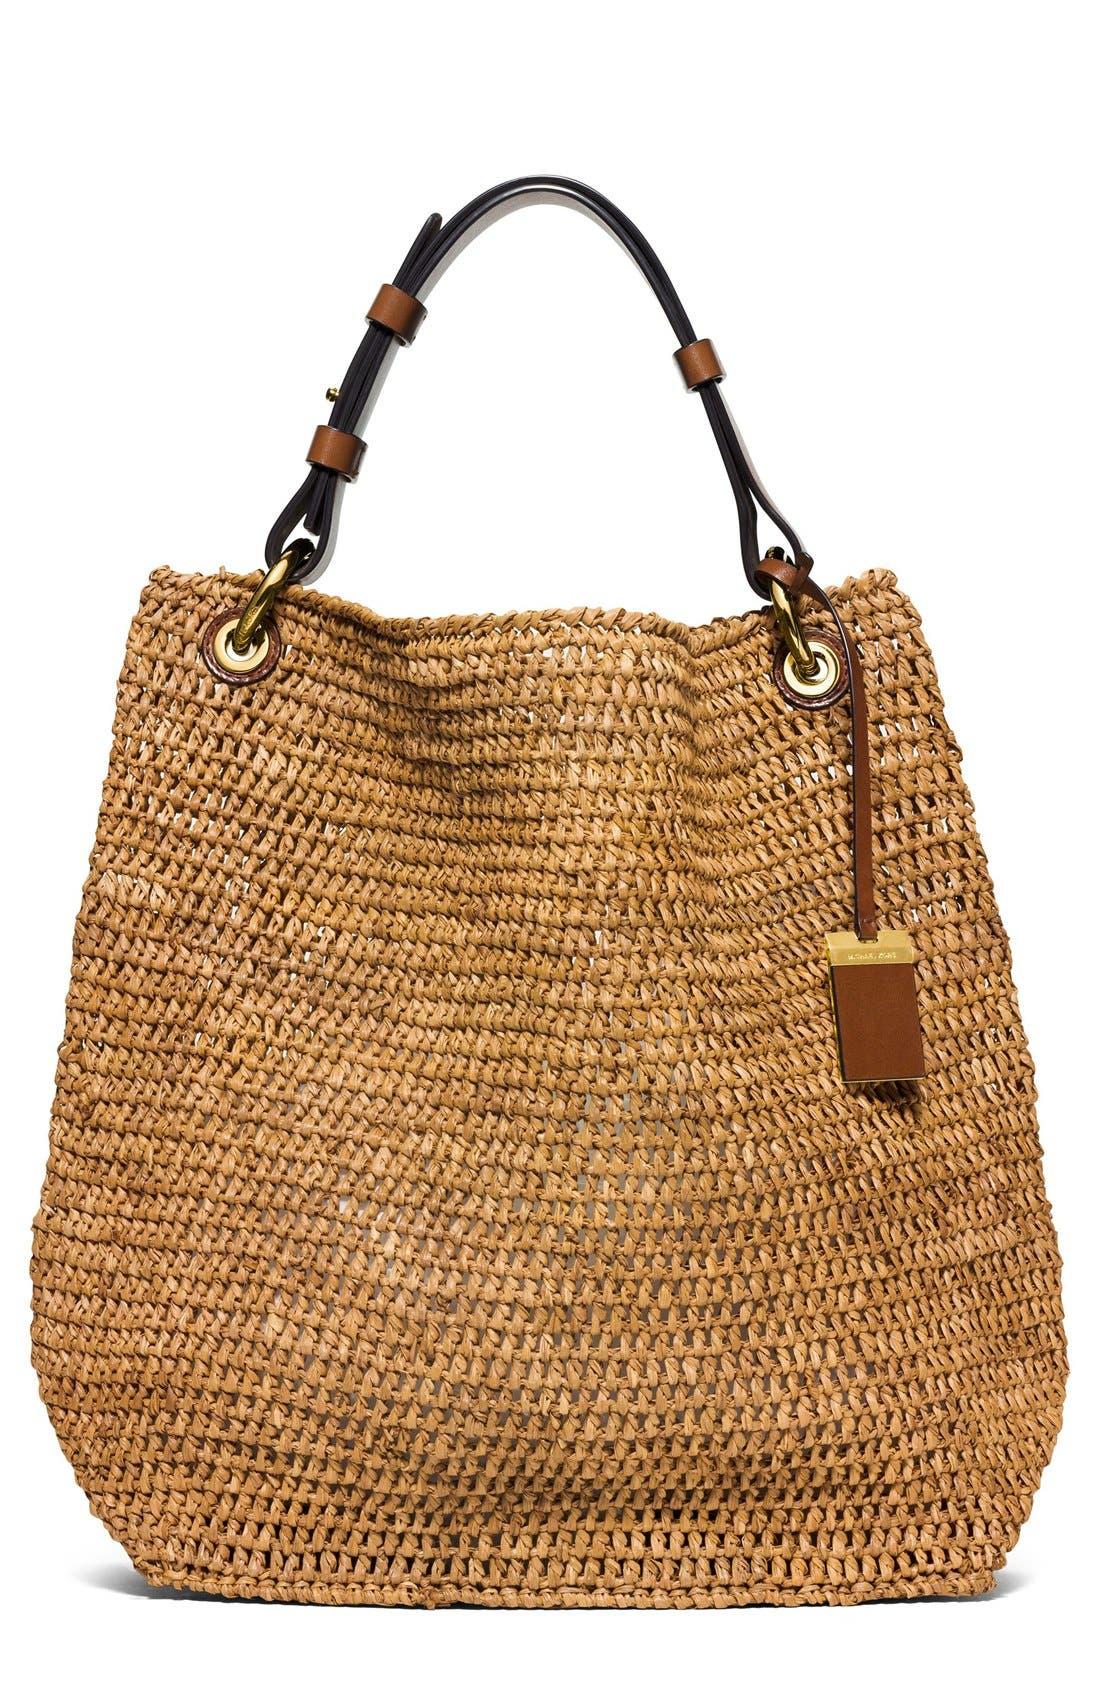 Main Image - Michael Kors 'Large Santorini' Raffia Shoulder Bag